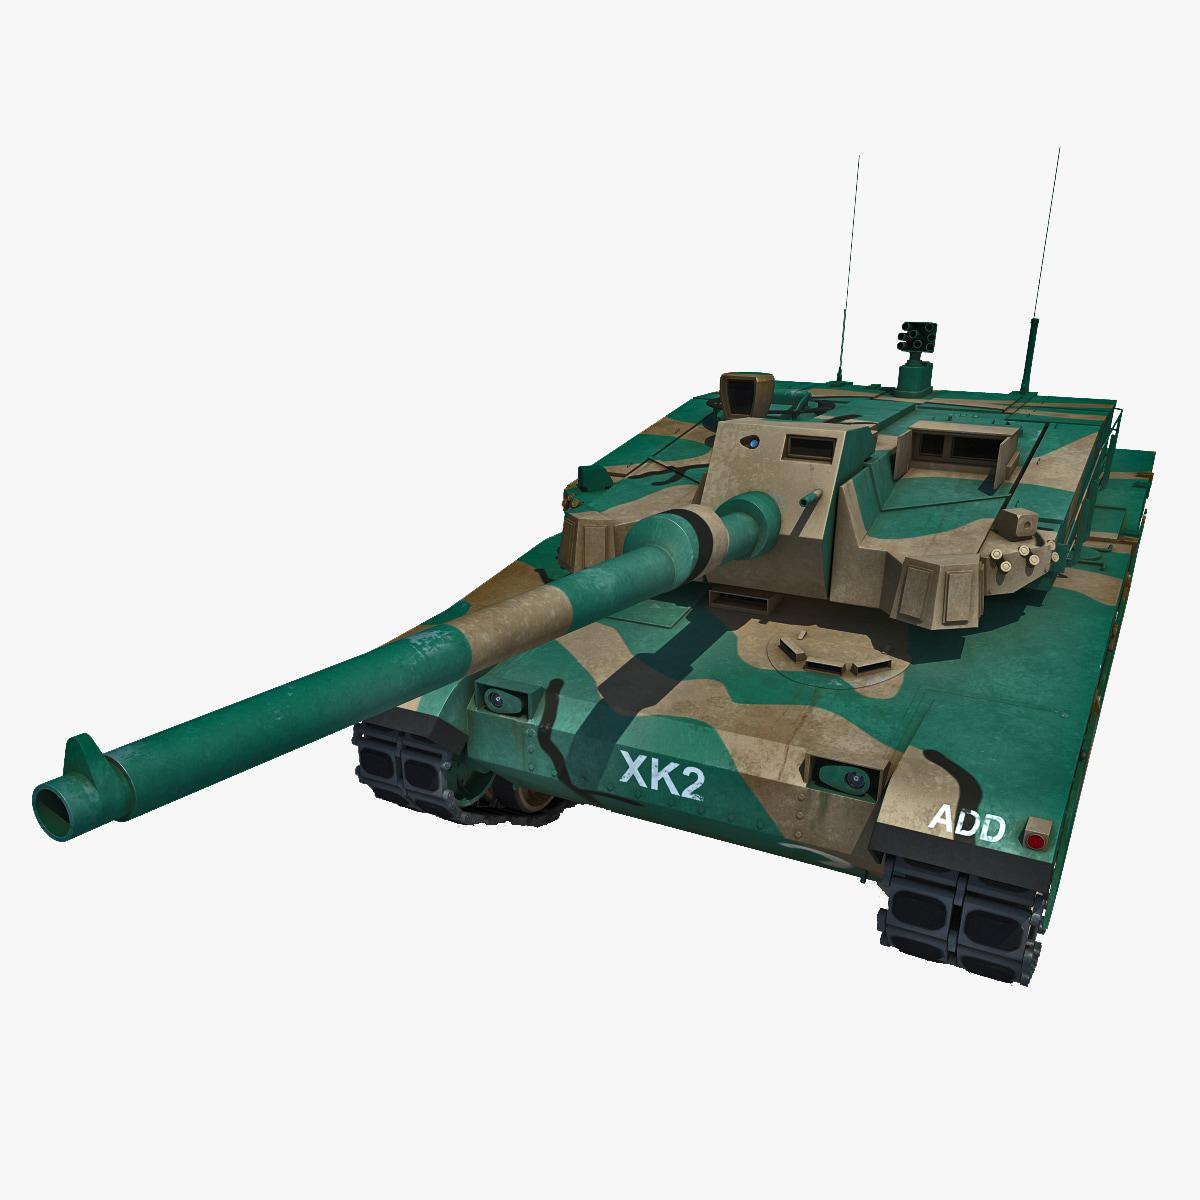 Korea_Main_Battle_Tank_XK2_Black_Panther_v1_000_2.jpg